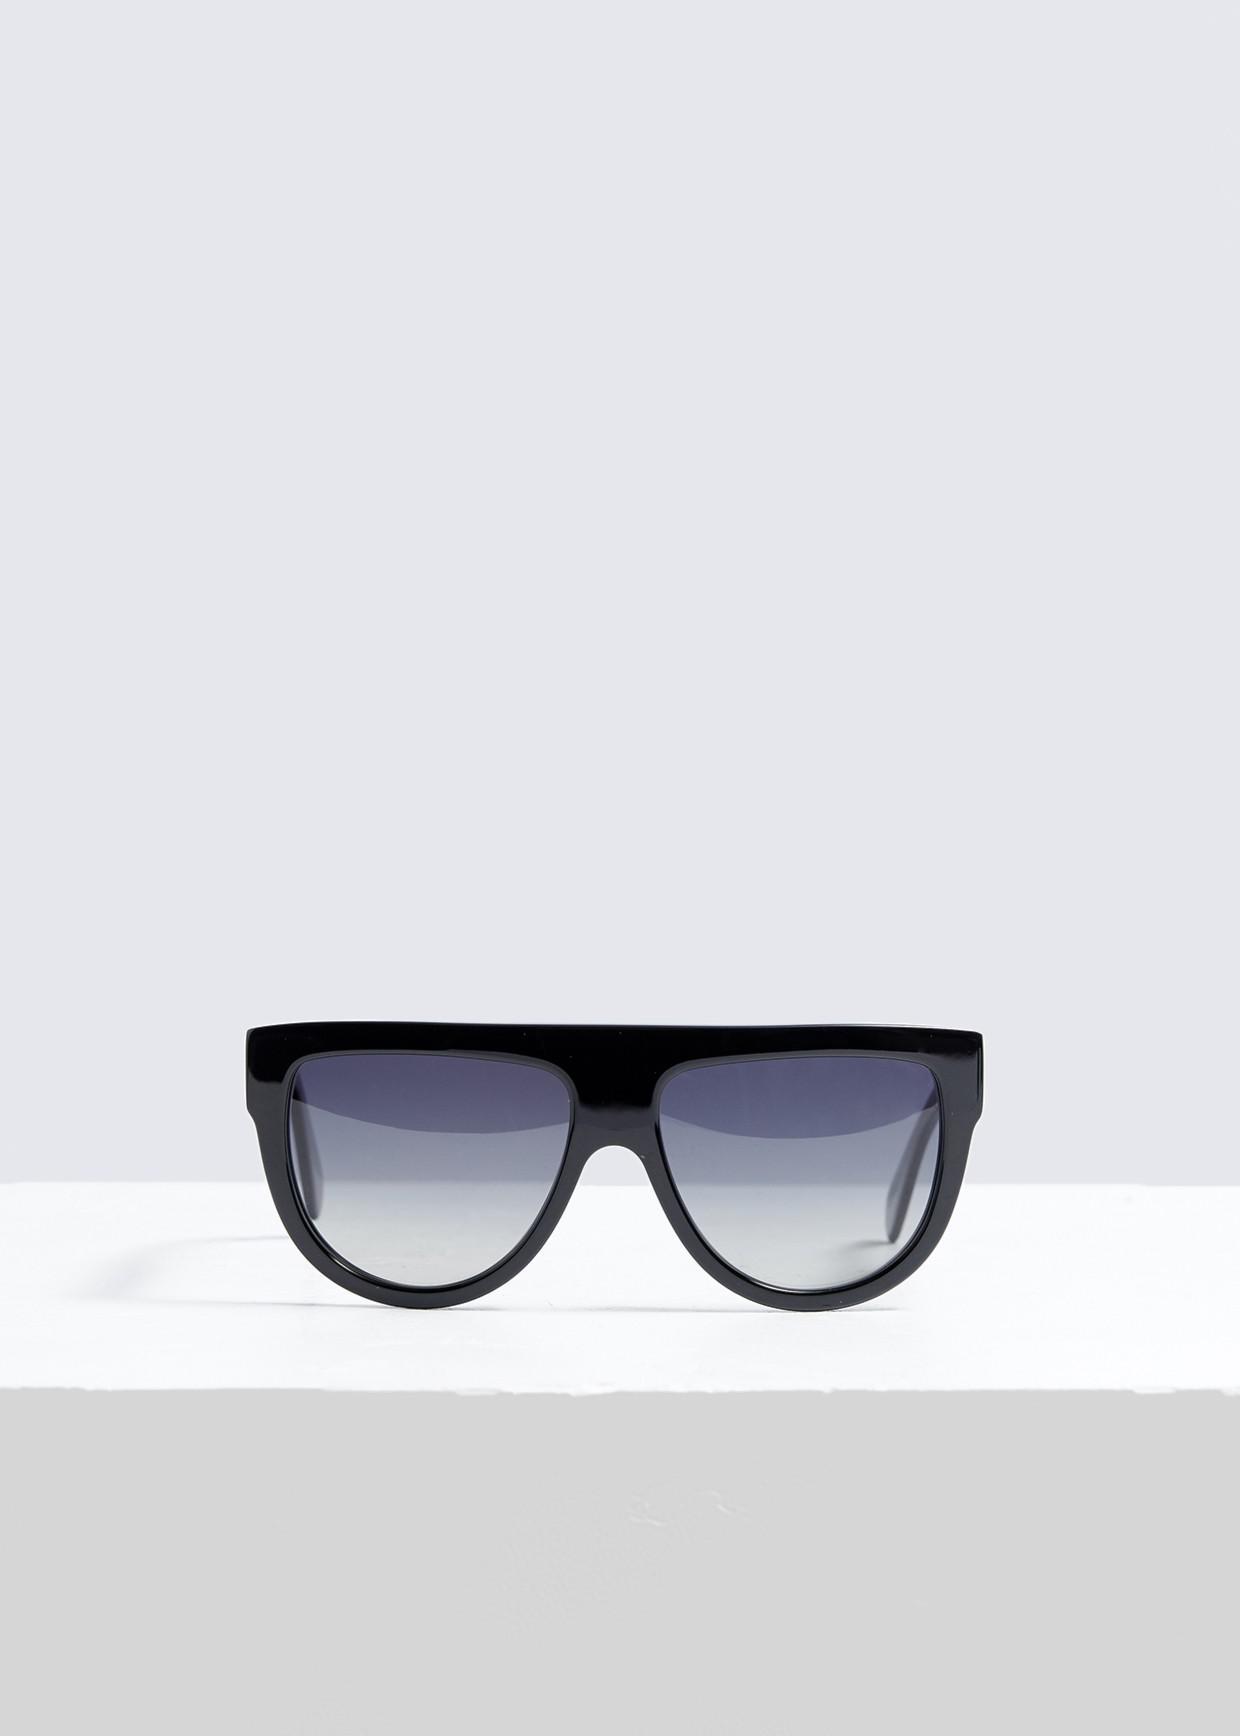 8819eef1ce7 Céline Square Aviator Sunglasses in Black - Lyst